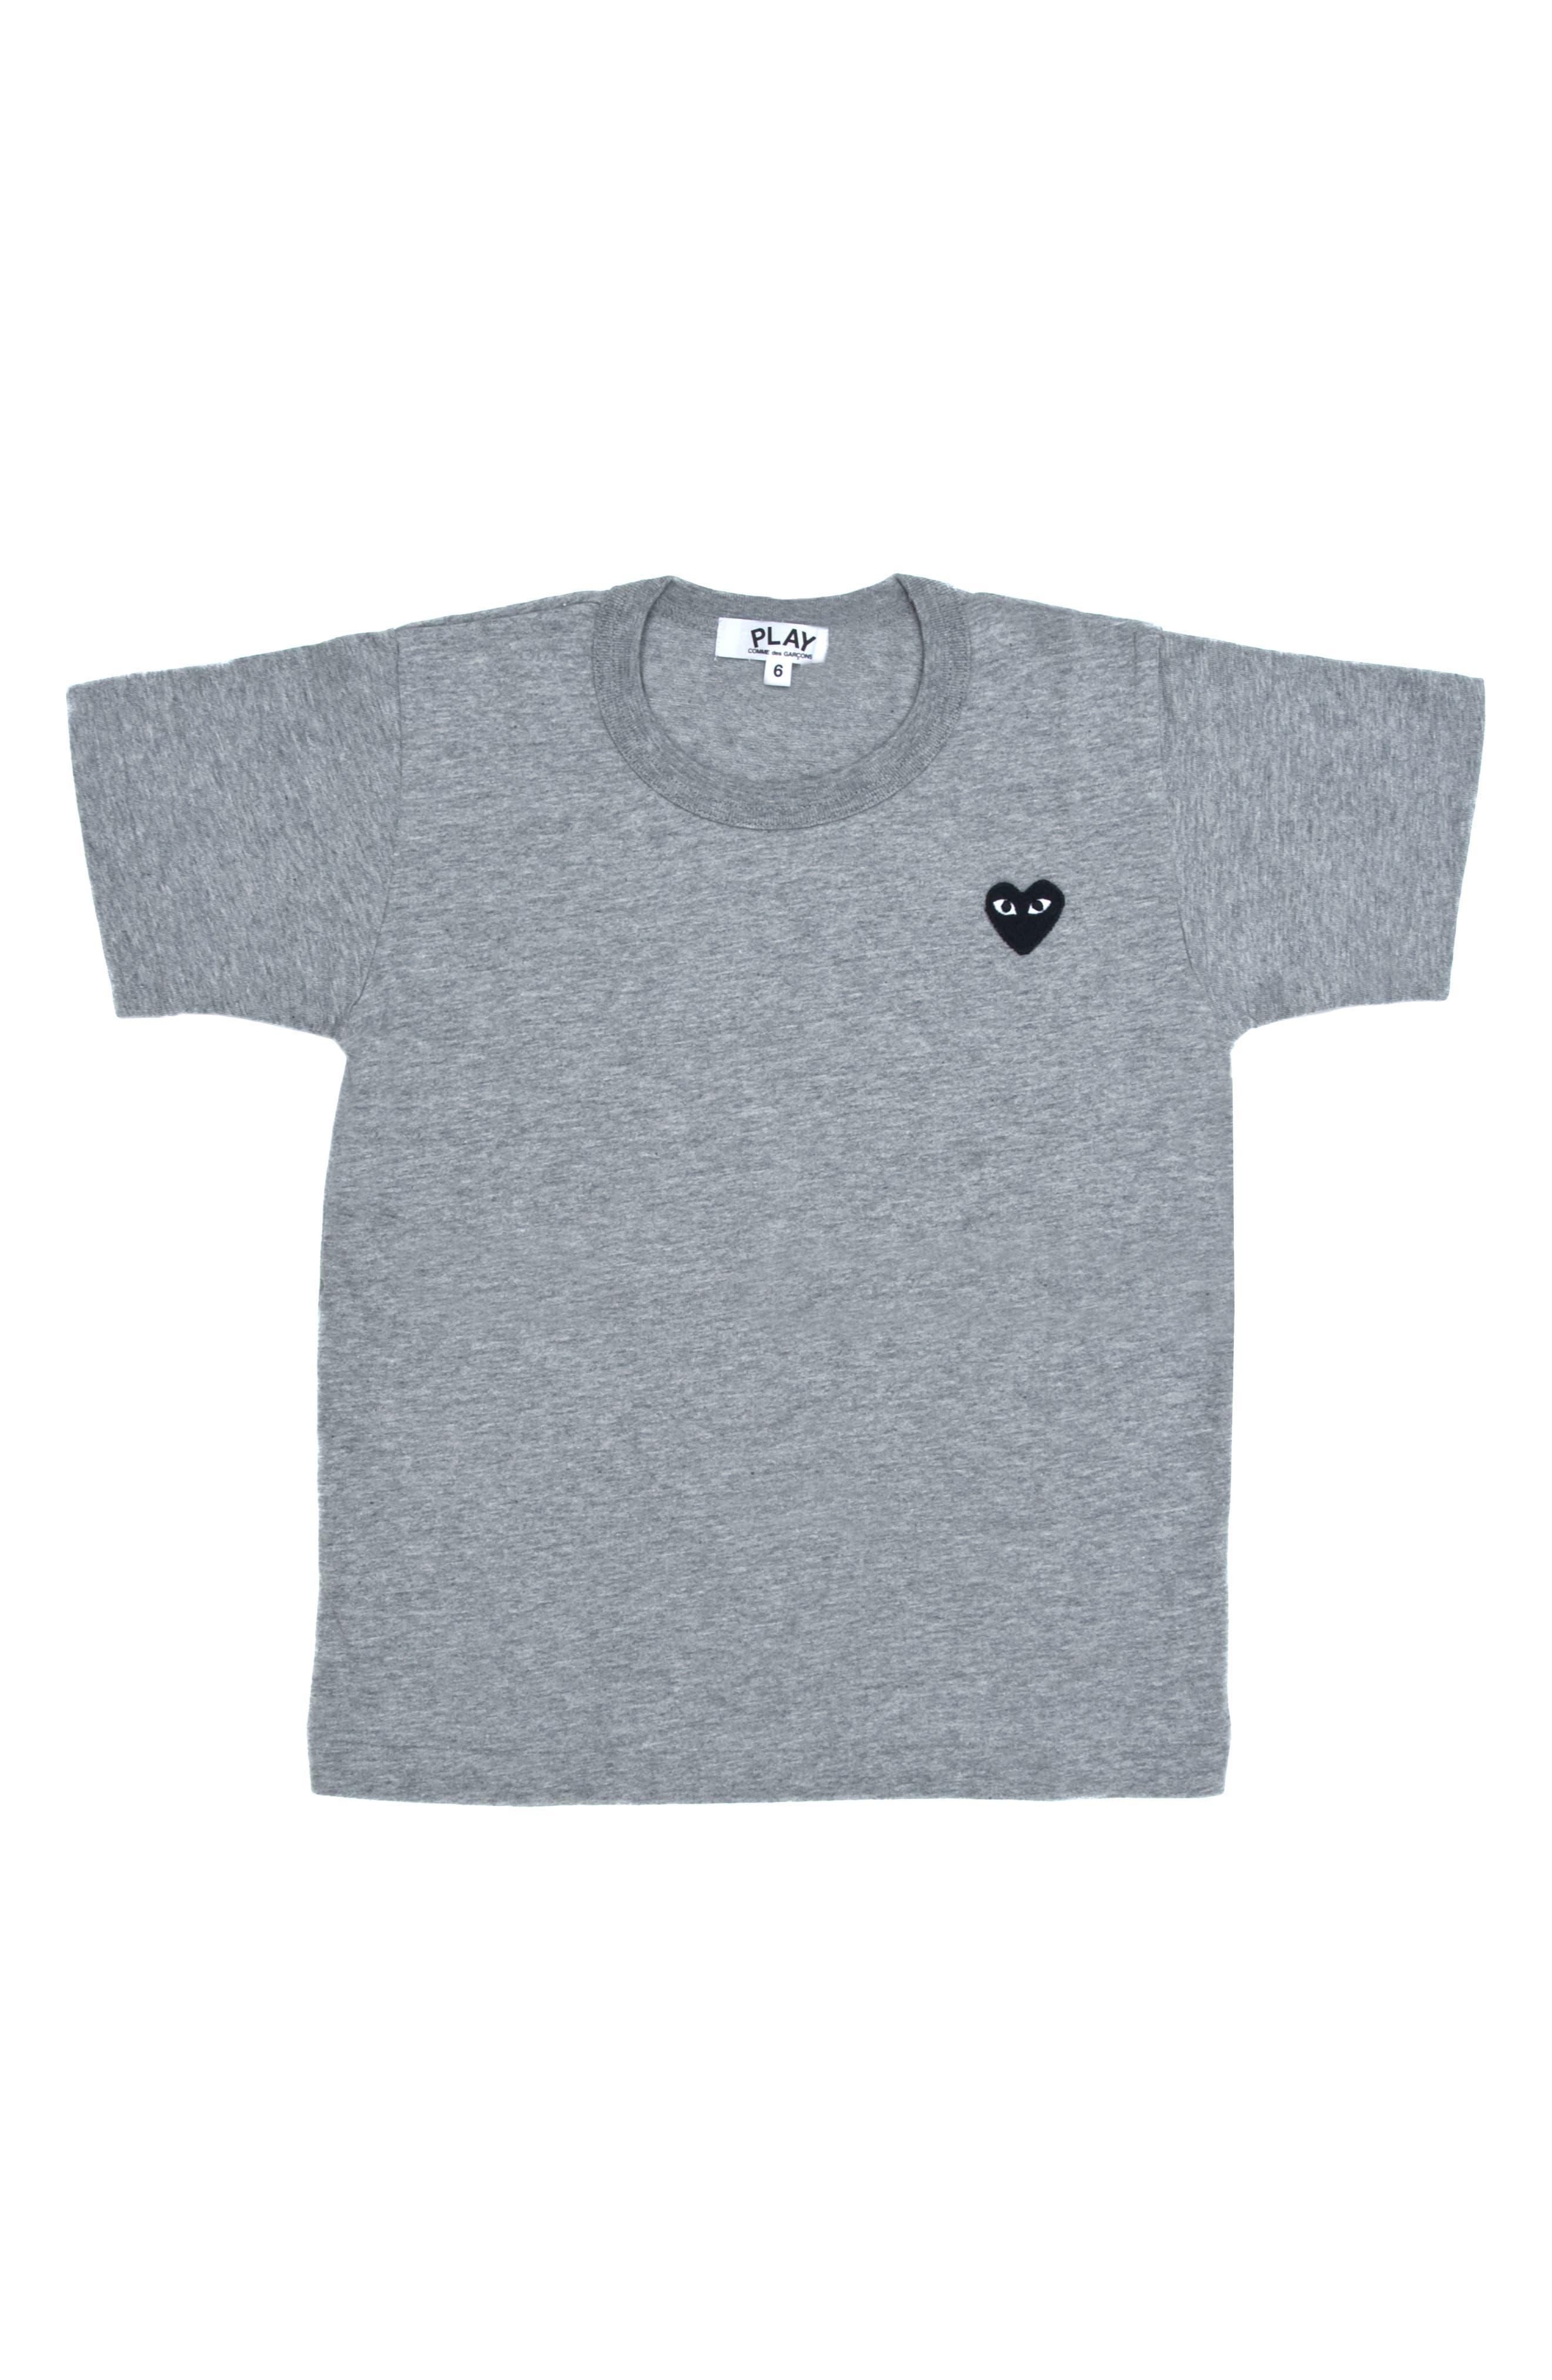 Little Black Heart T-Shirt,                             Main thumbnail 1, color,                             GREY